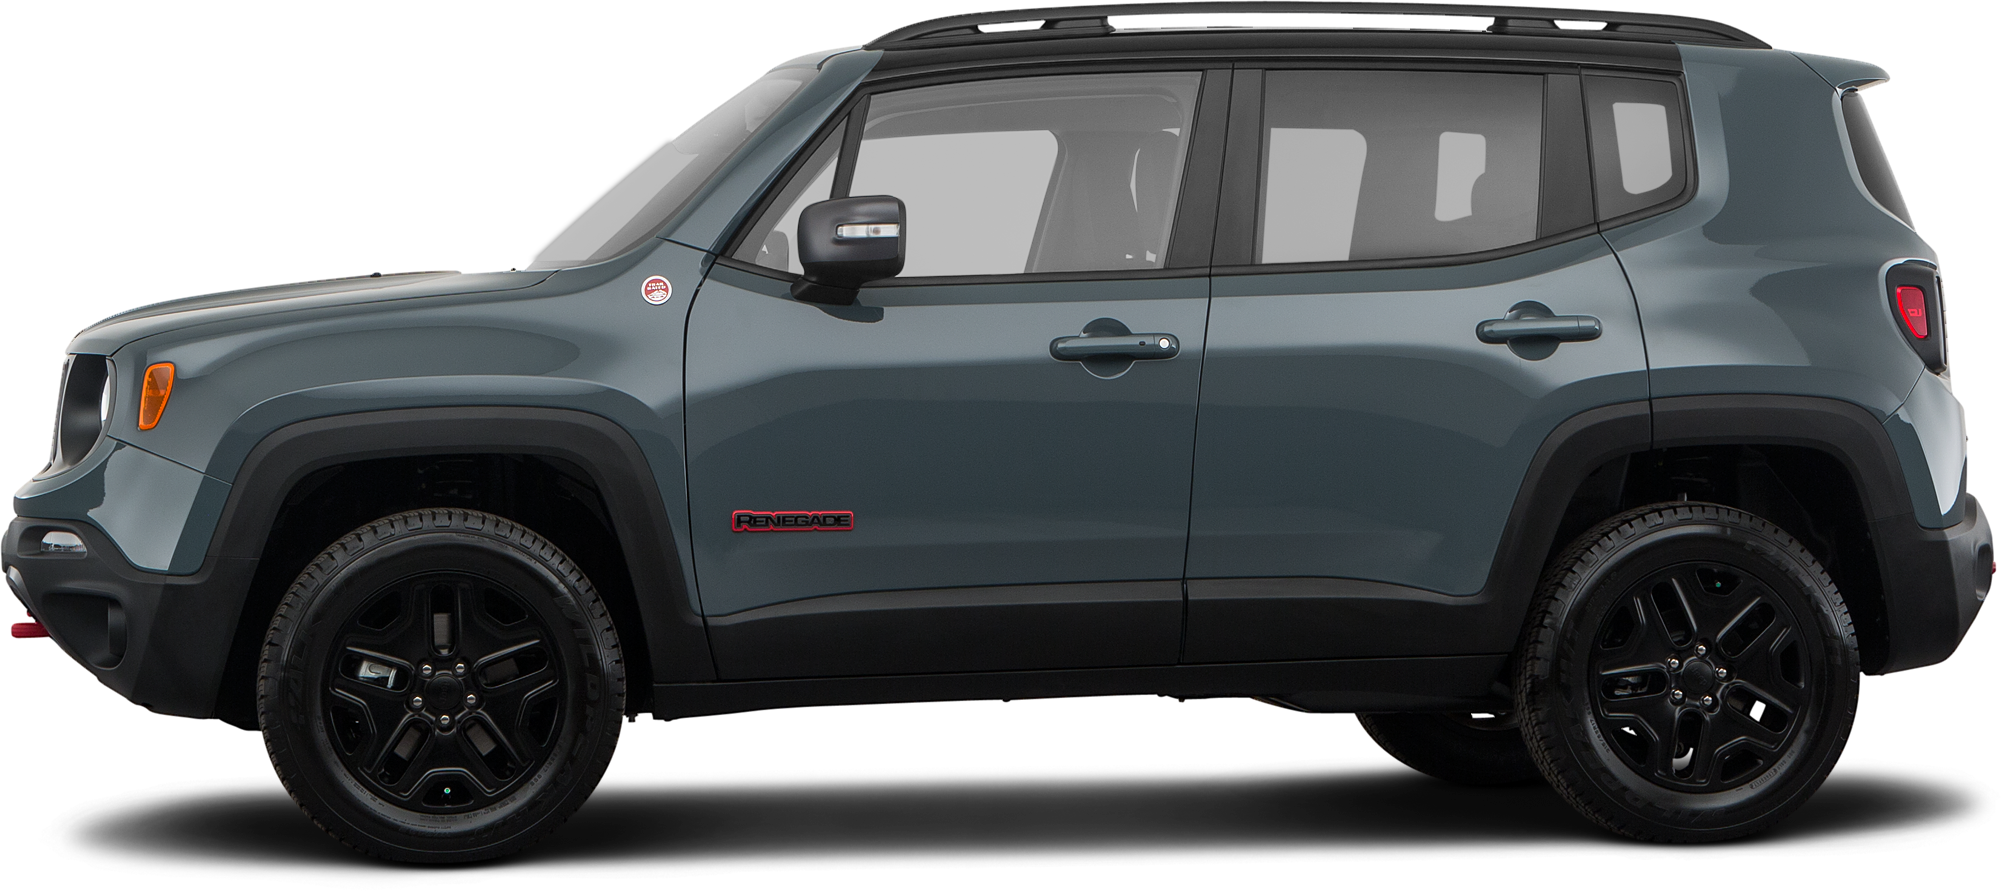 2018 Jeep Renegade SUV Trailhawk 4x4